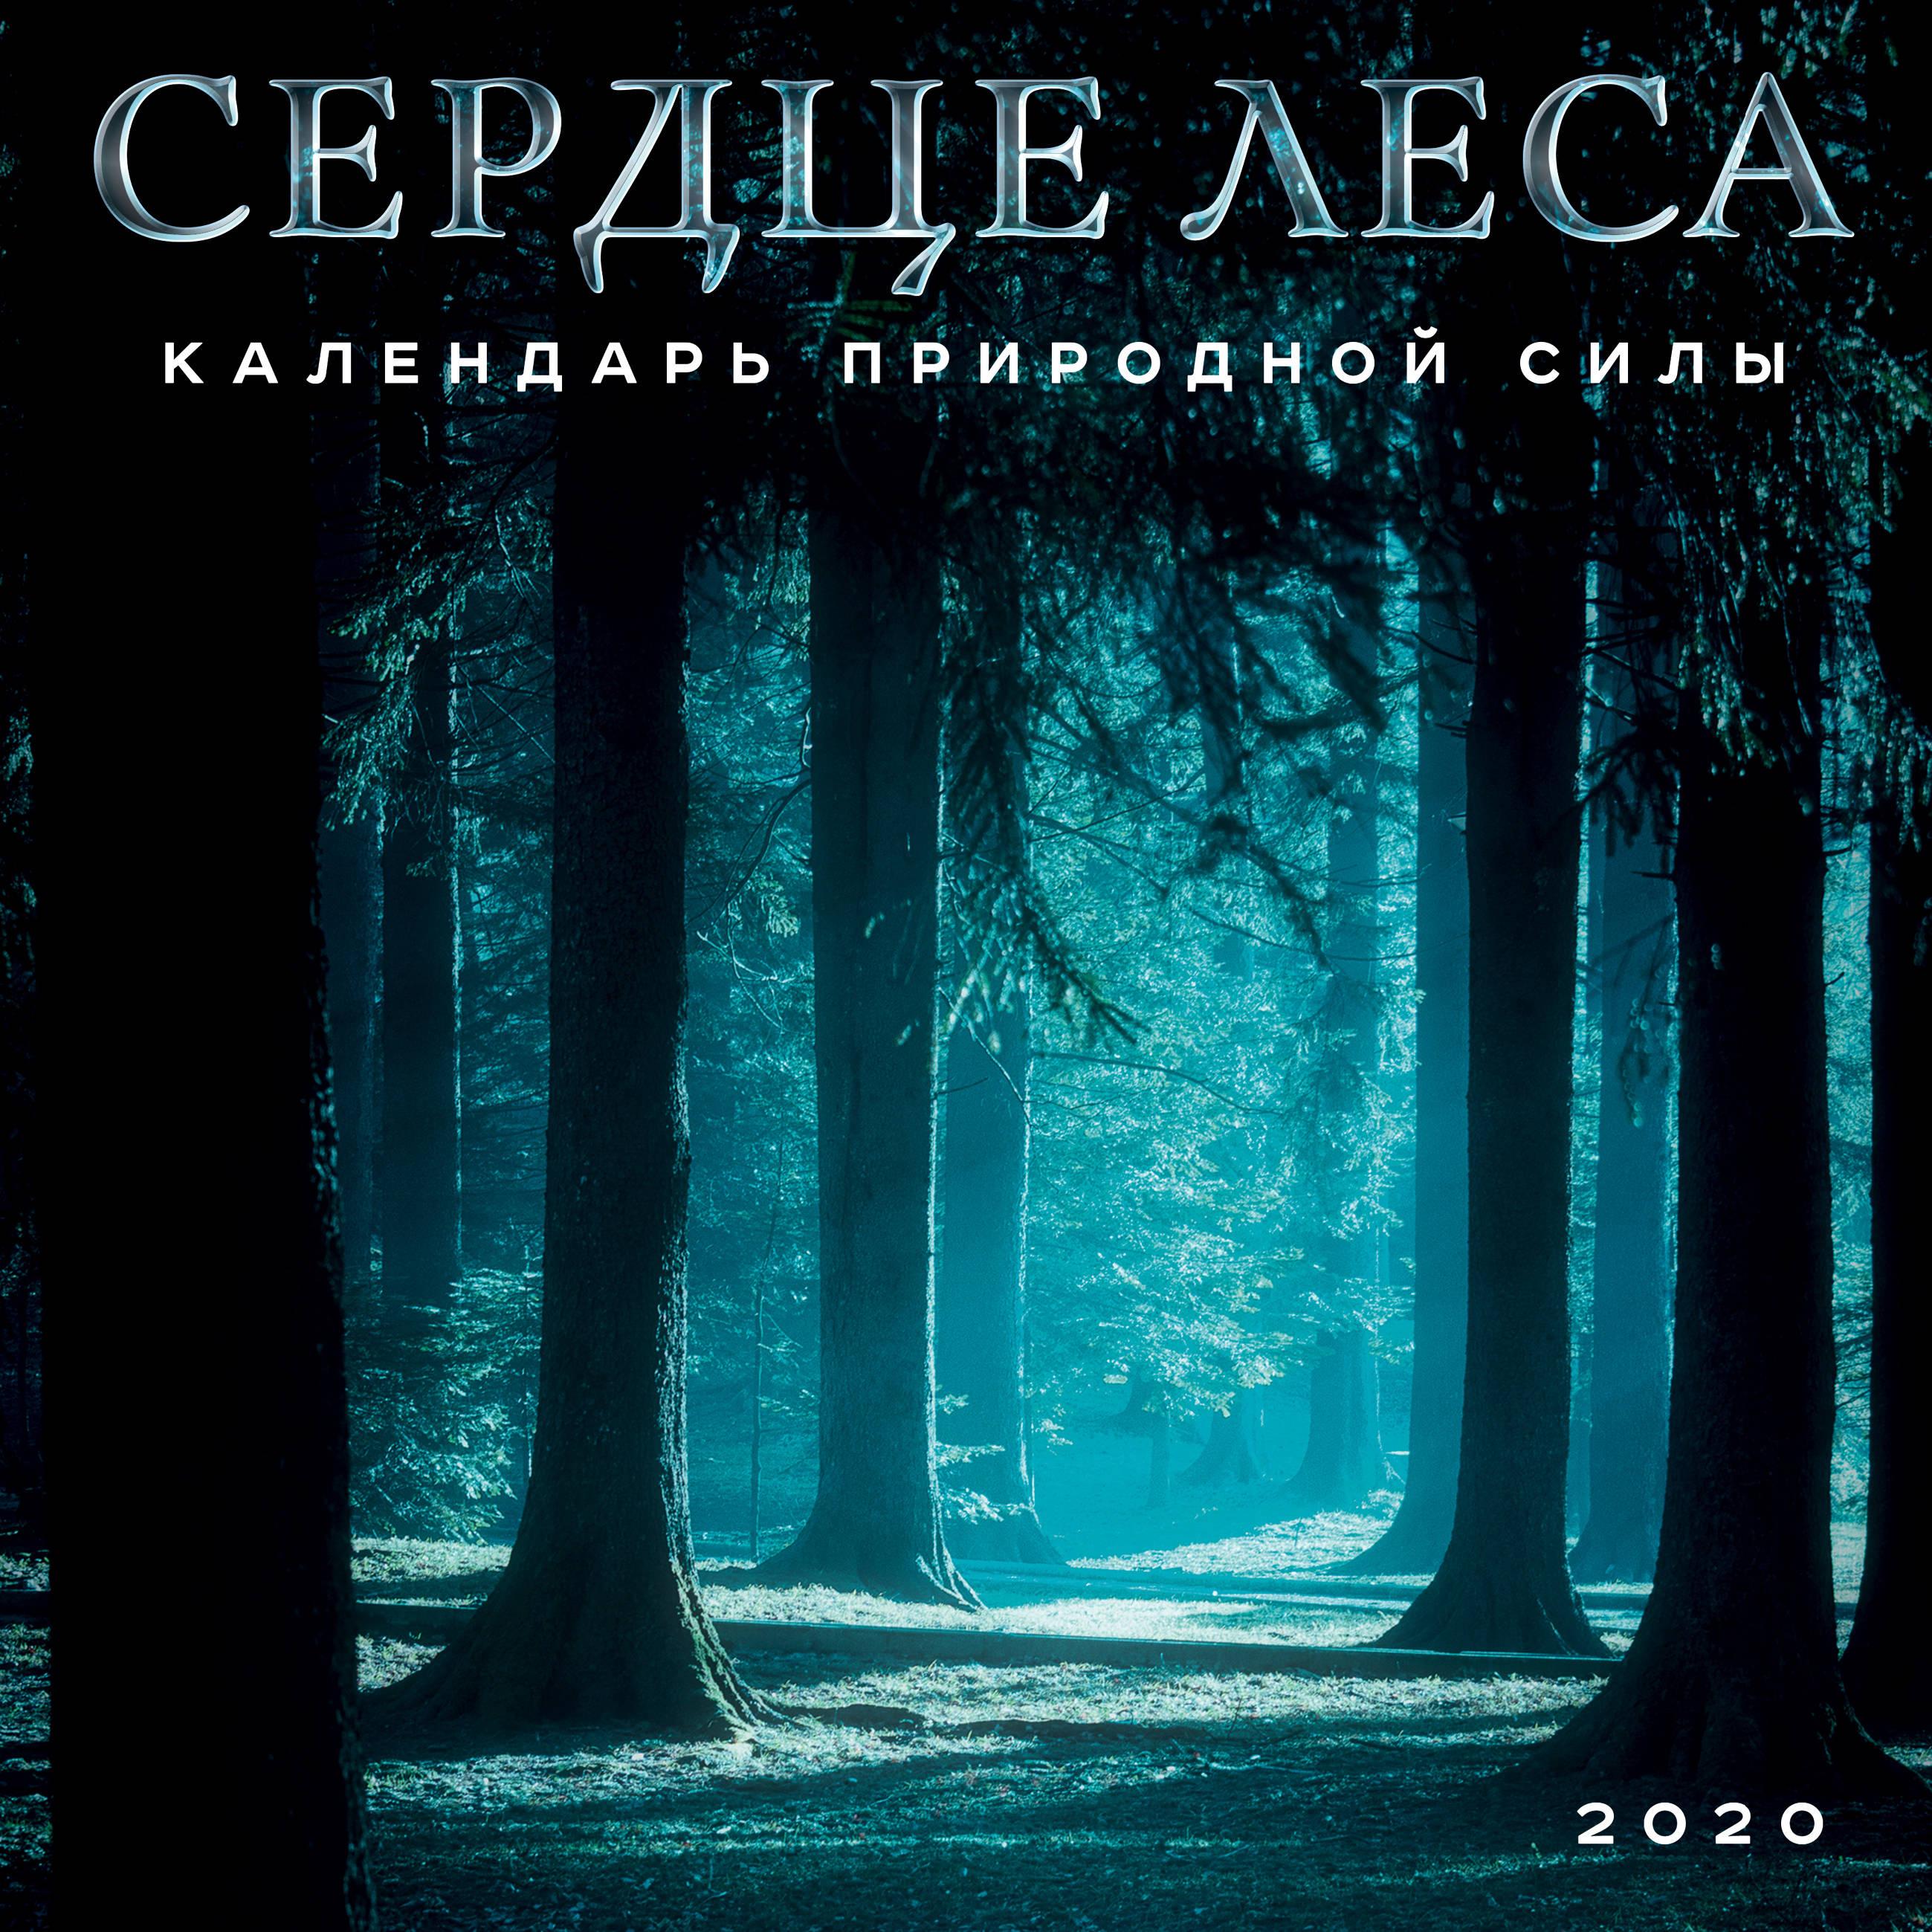 Сердце леса. Календарь настенный на 2020 год (300х300мм)